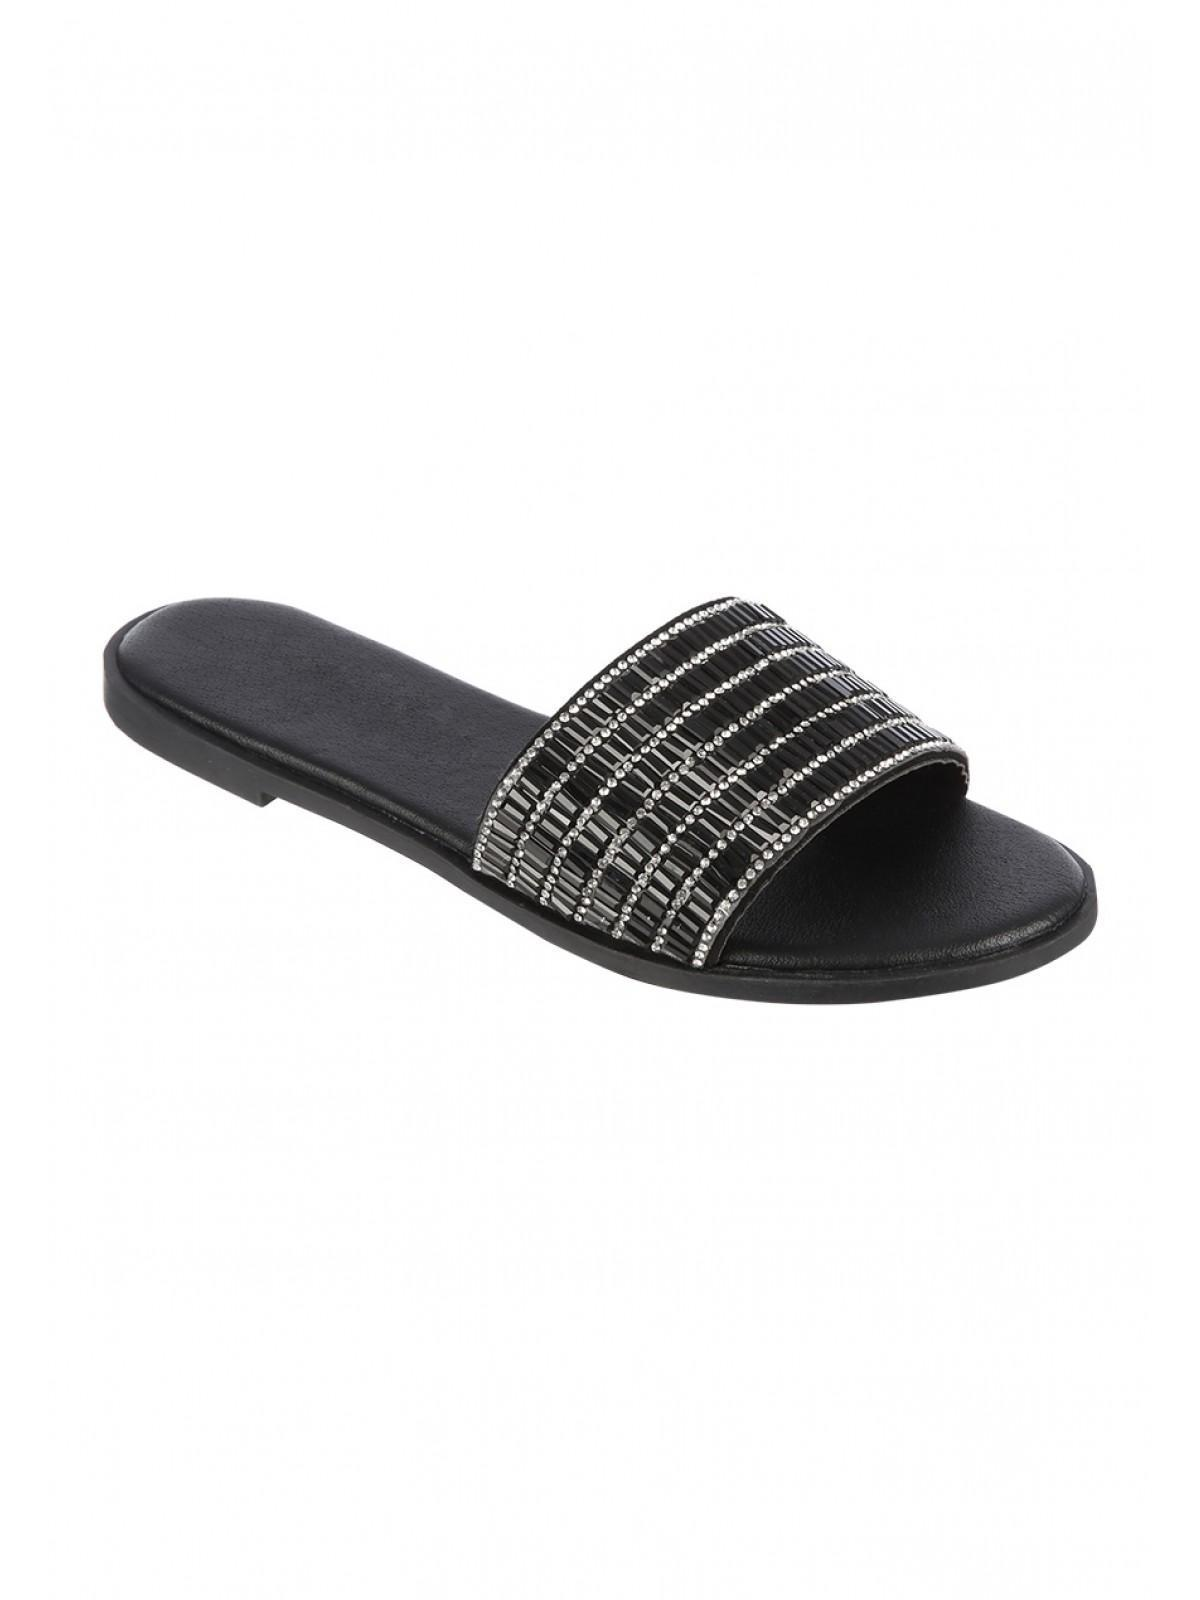 20ffa5df4493 Womens Black Diamante Mule Sandals